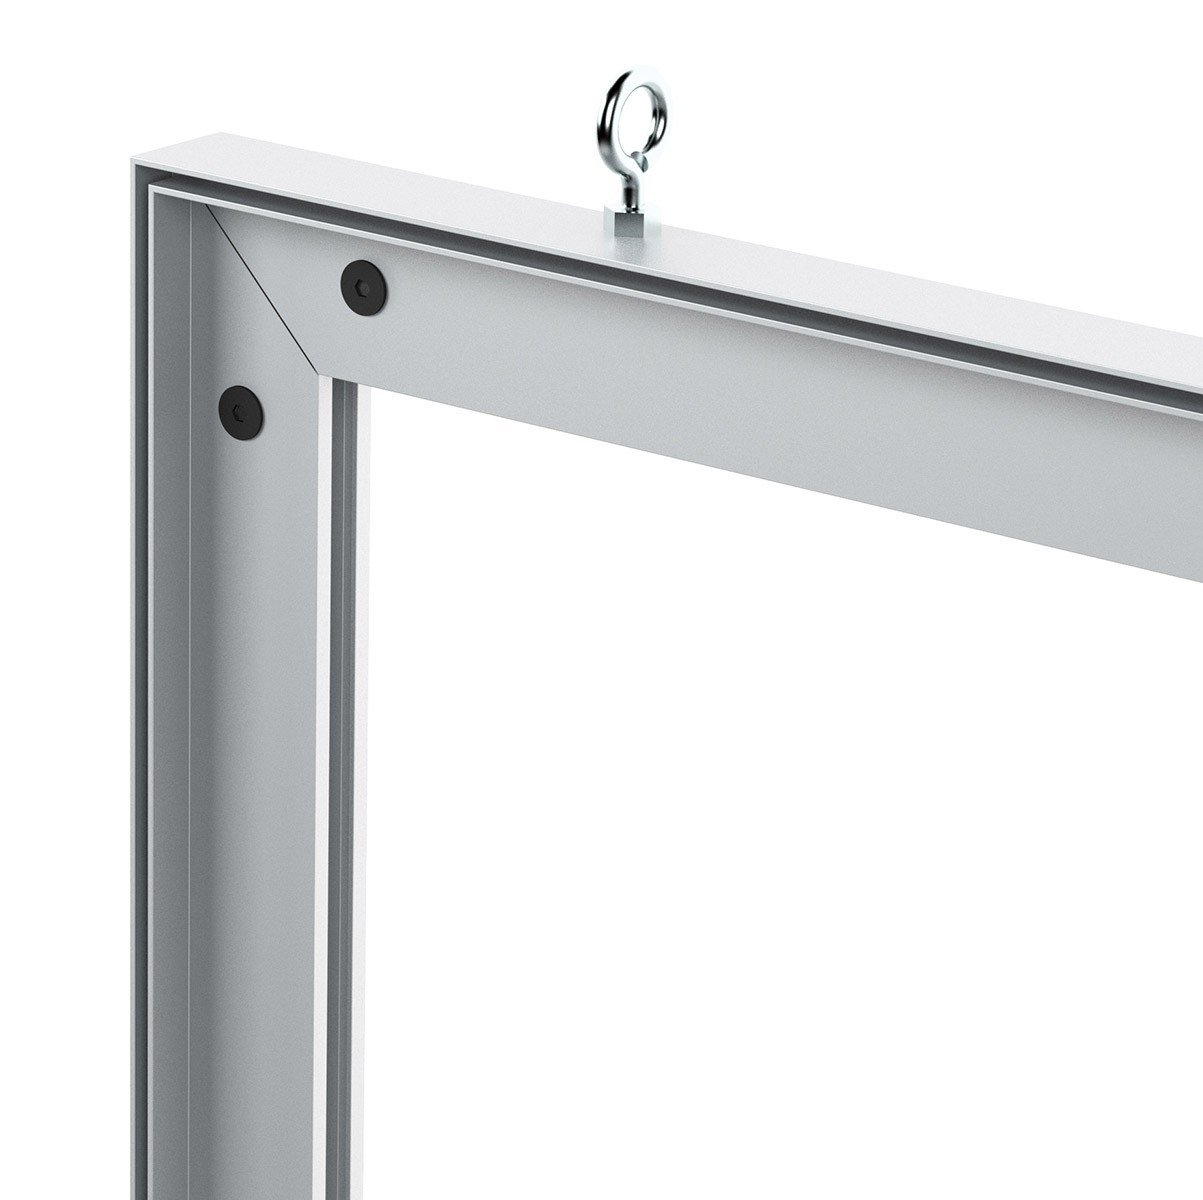 Charisma 24x48 Double Sided SEG Fabric Frame | Power-Graphics.com